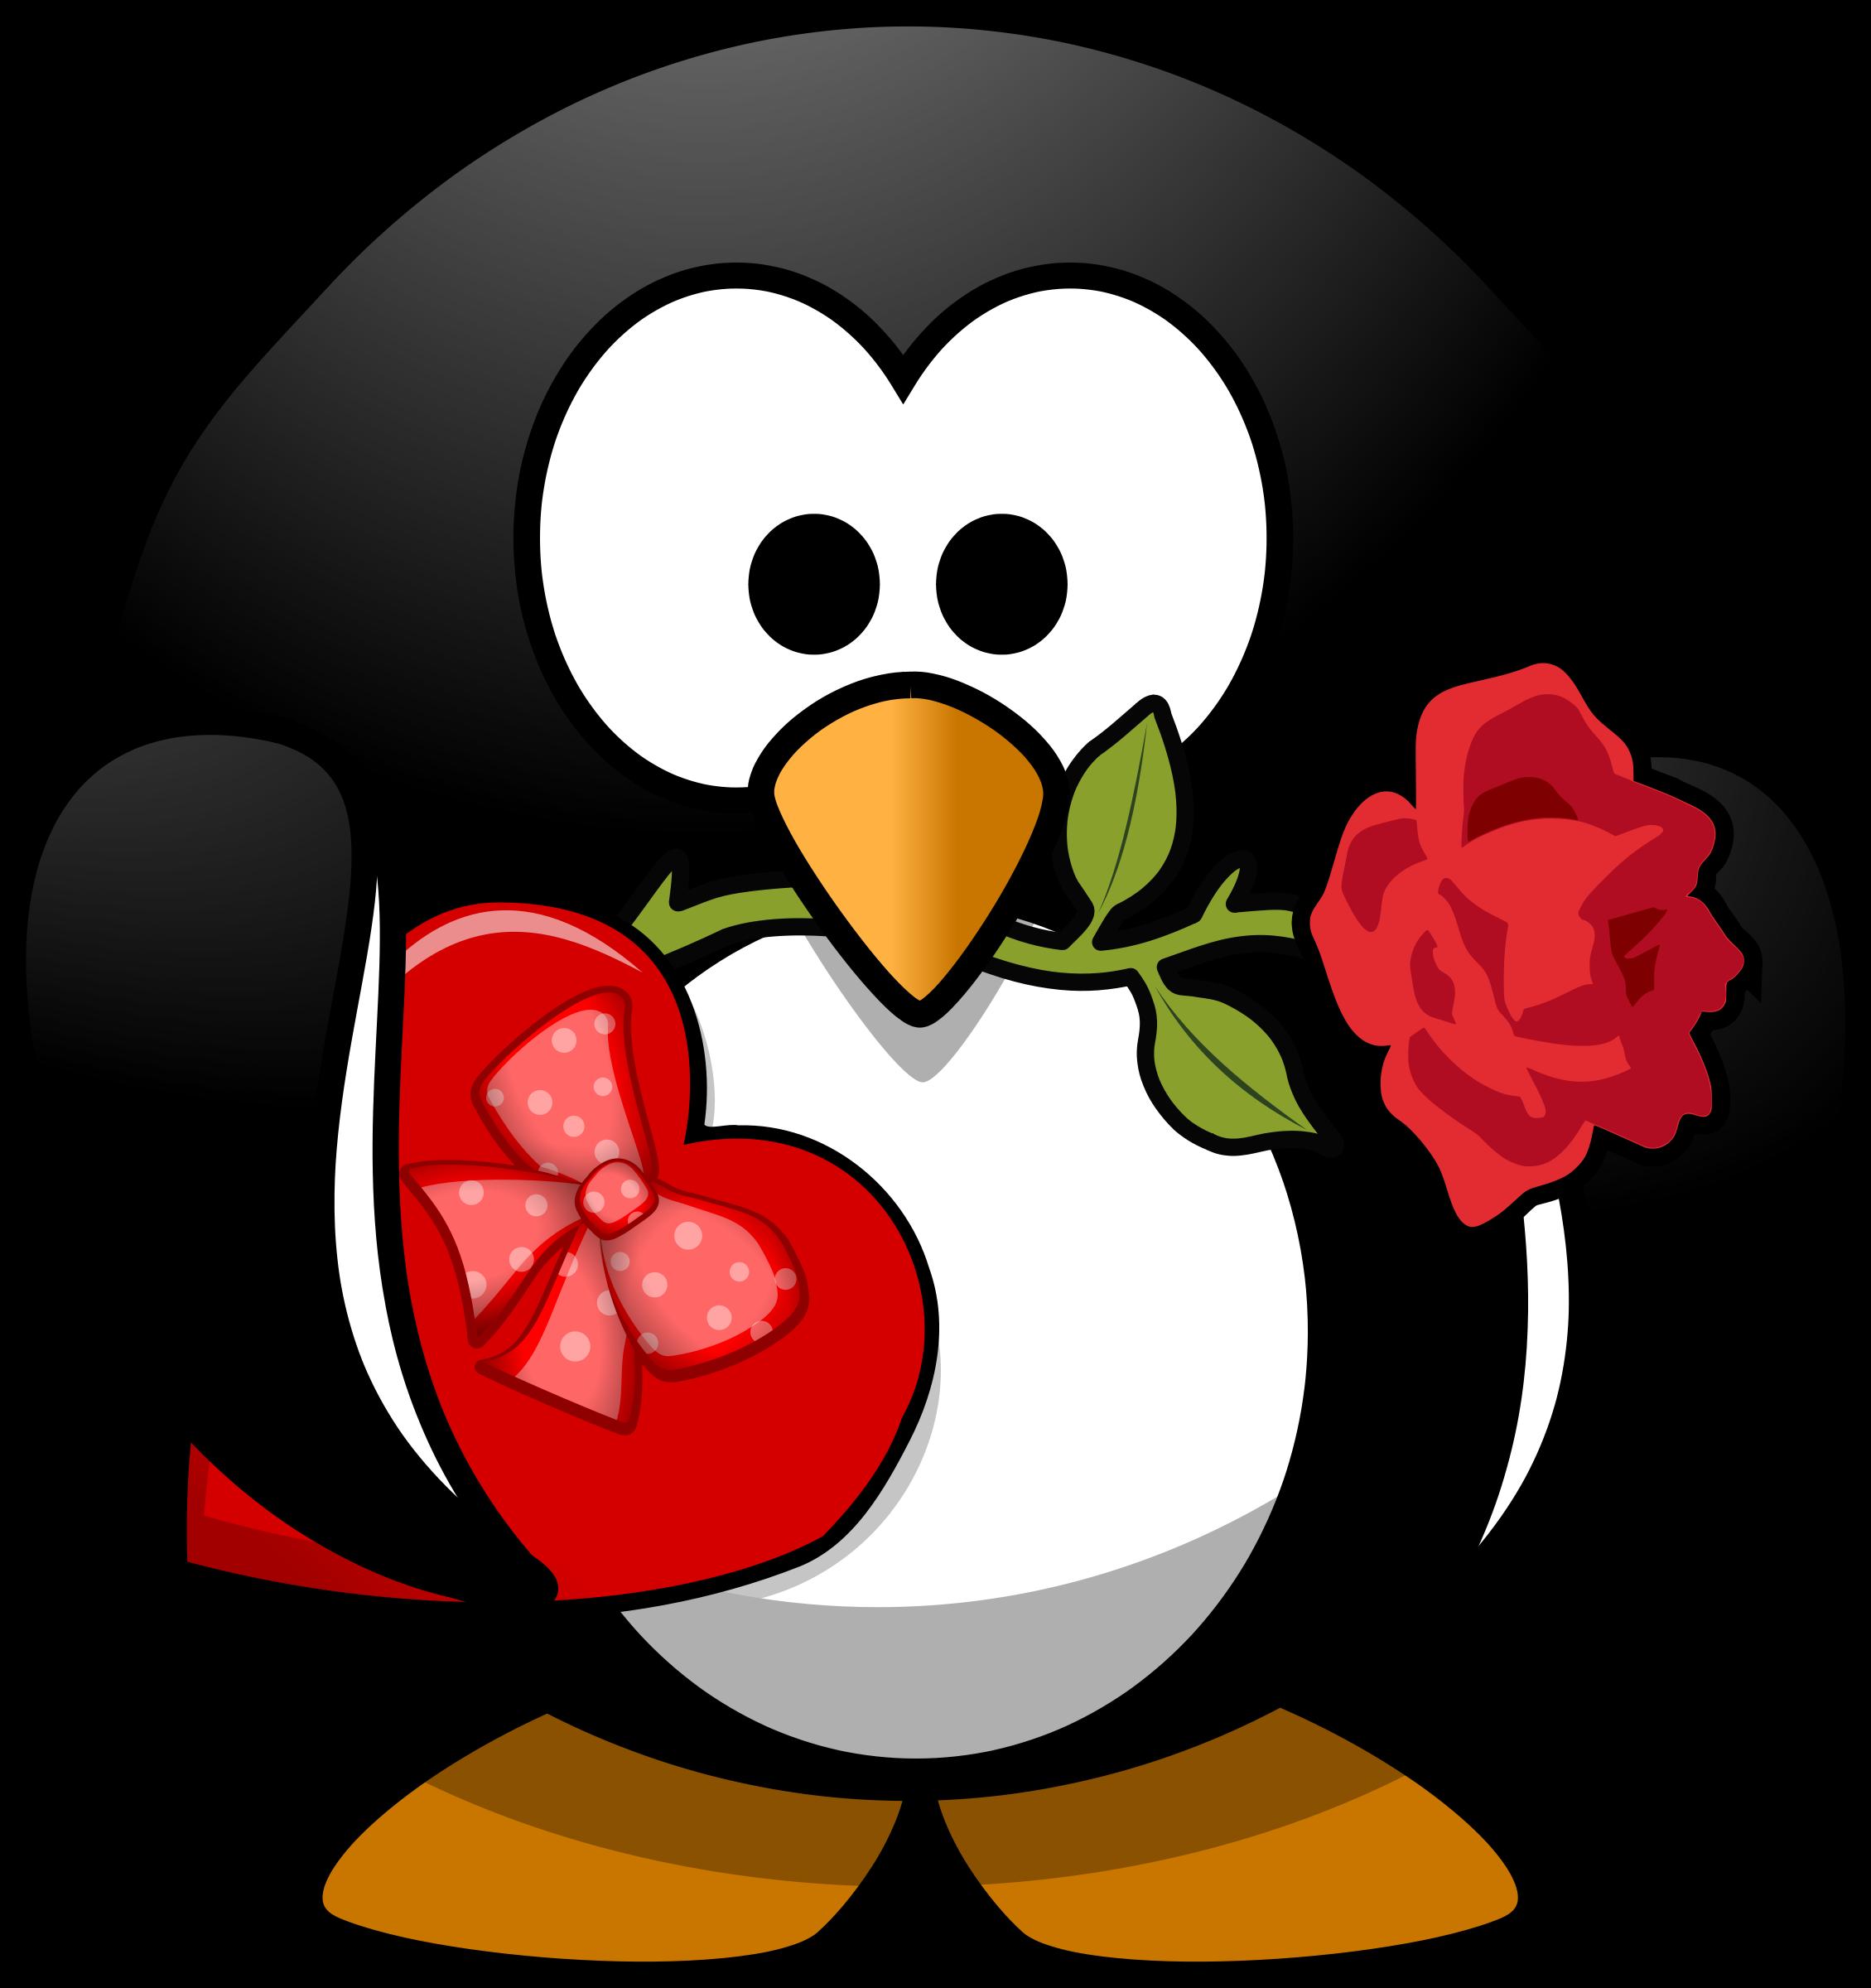 Valentines day clipart monkey jpg freeuse library Free Funny Valentines Cliparts, Download Free Clip Art, Free ... jpg freeuse library